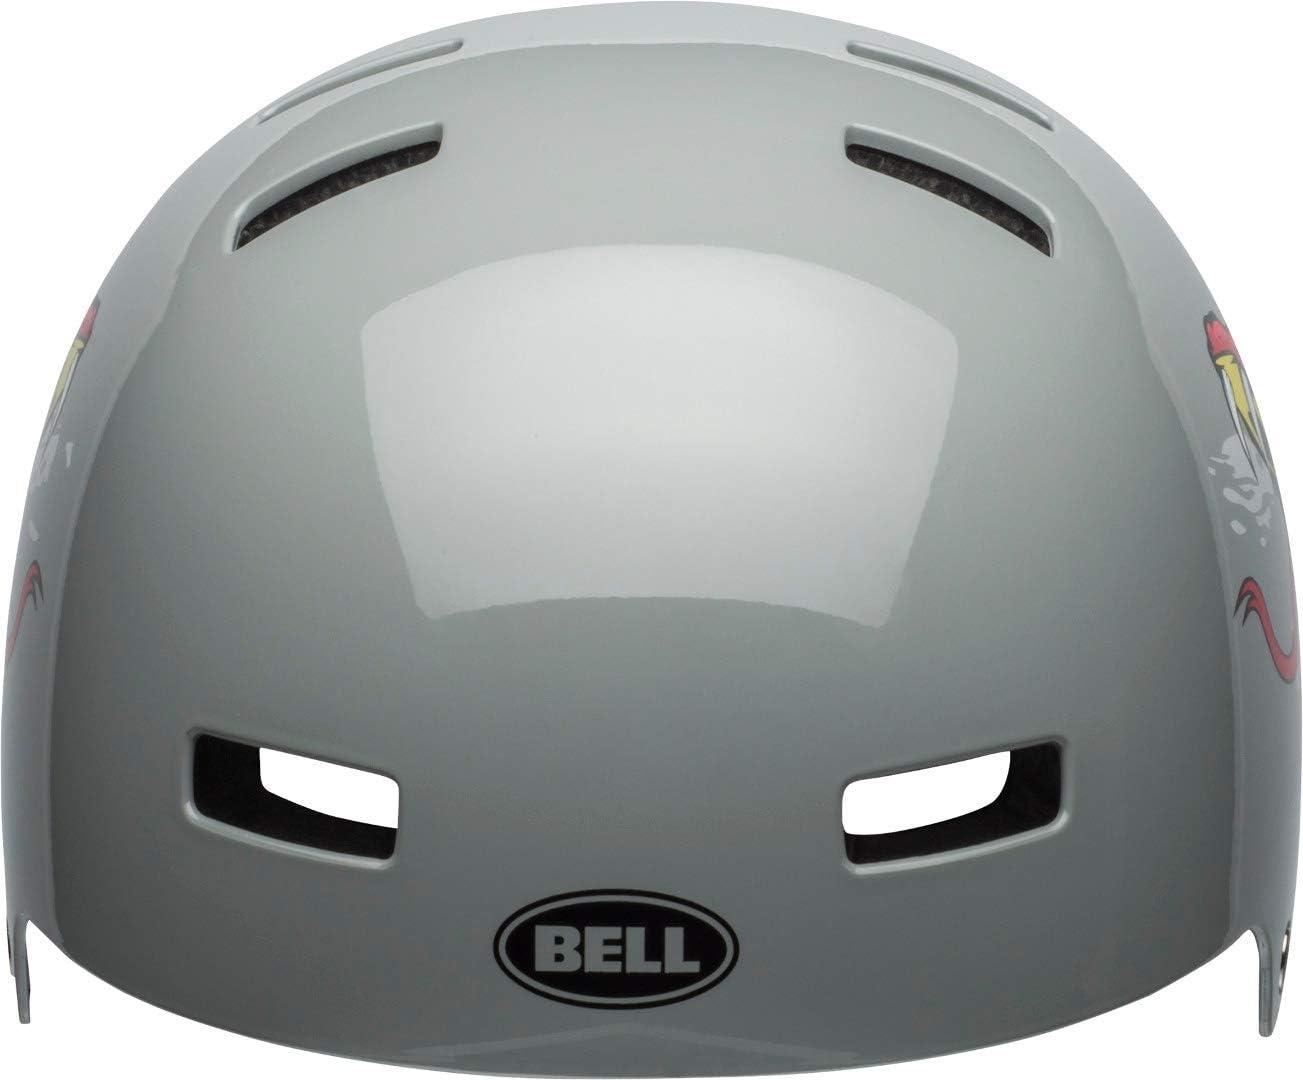 Bell Span Casque 51-55 cm NEUF!